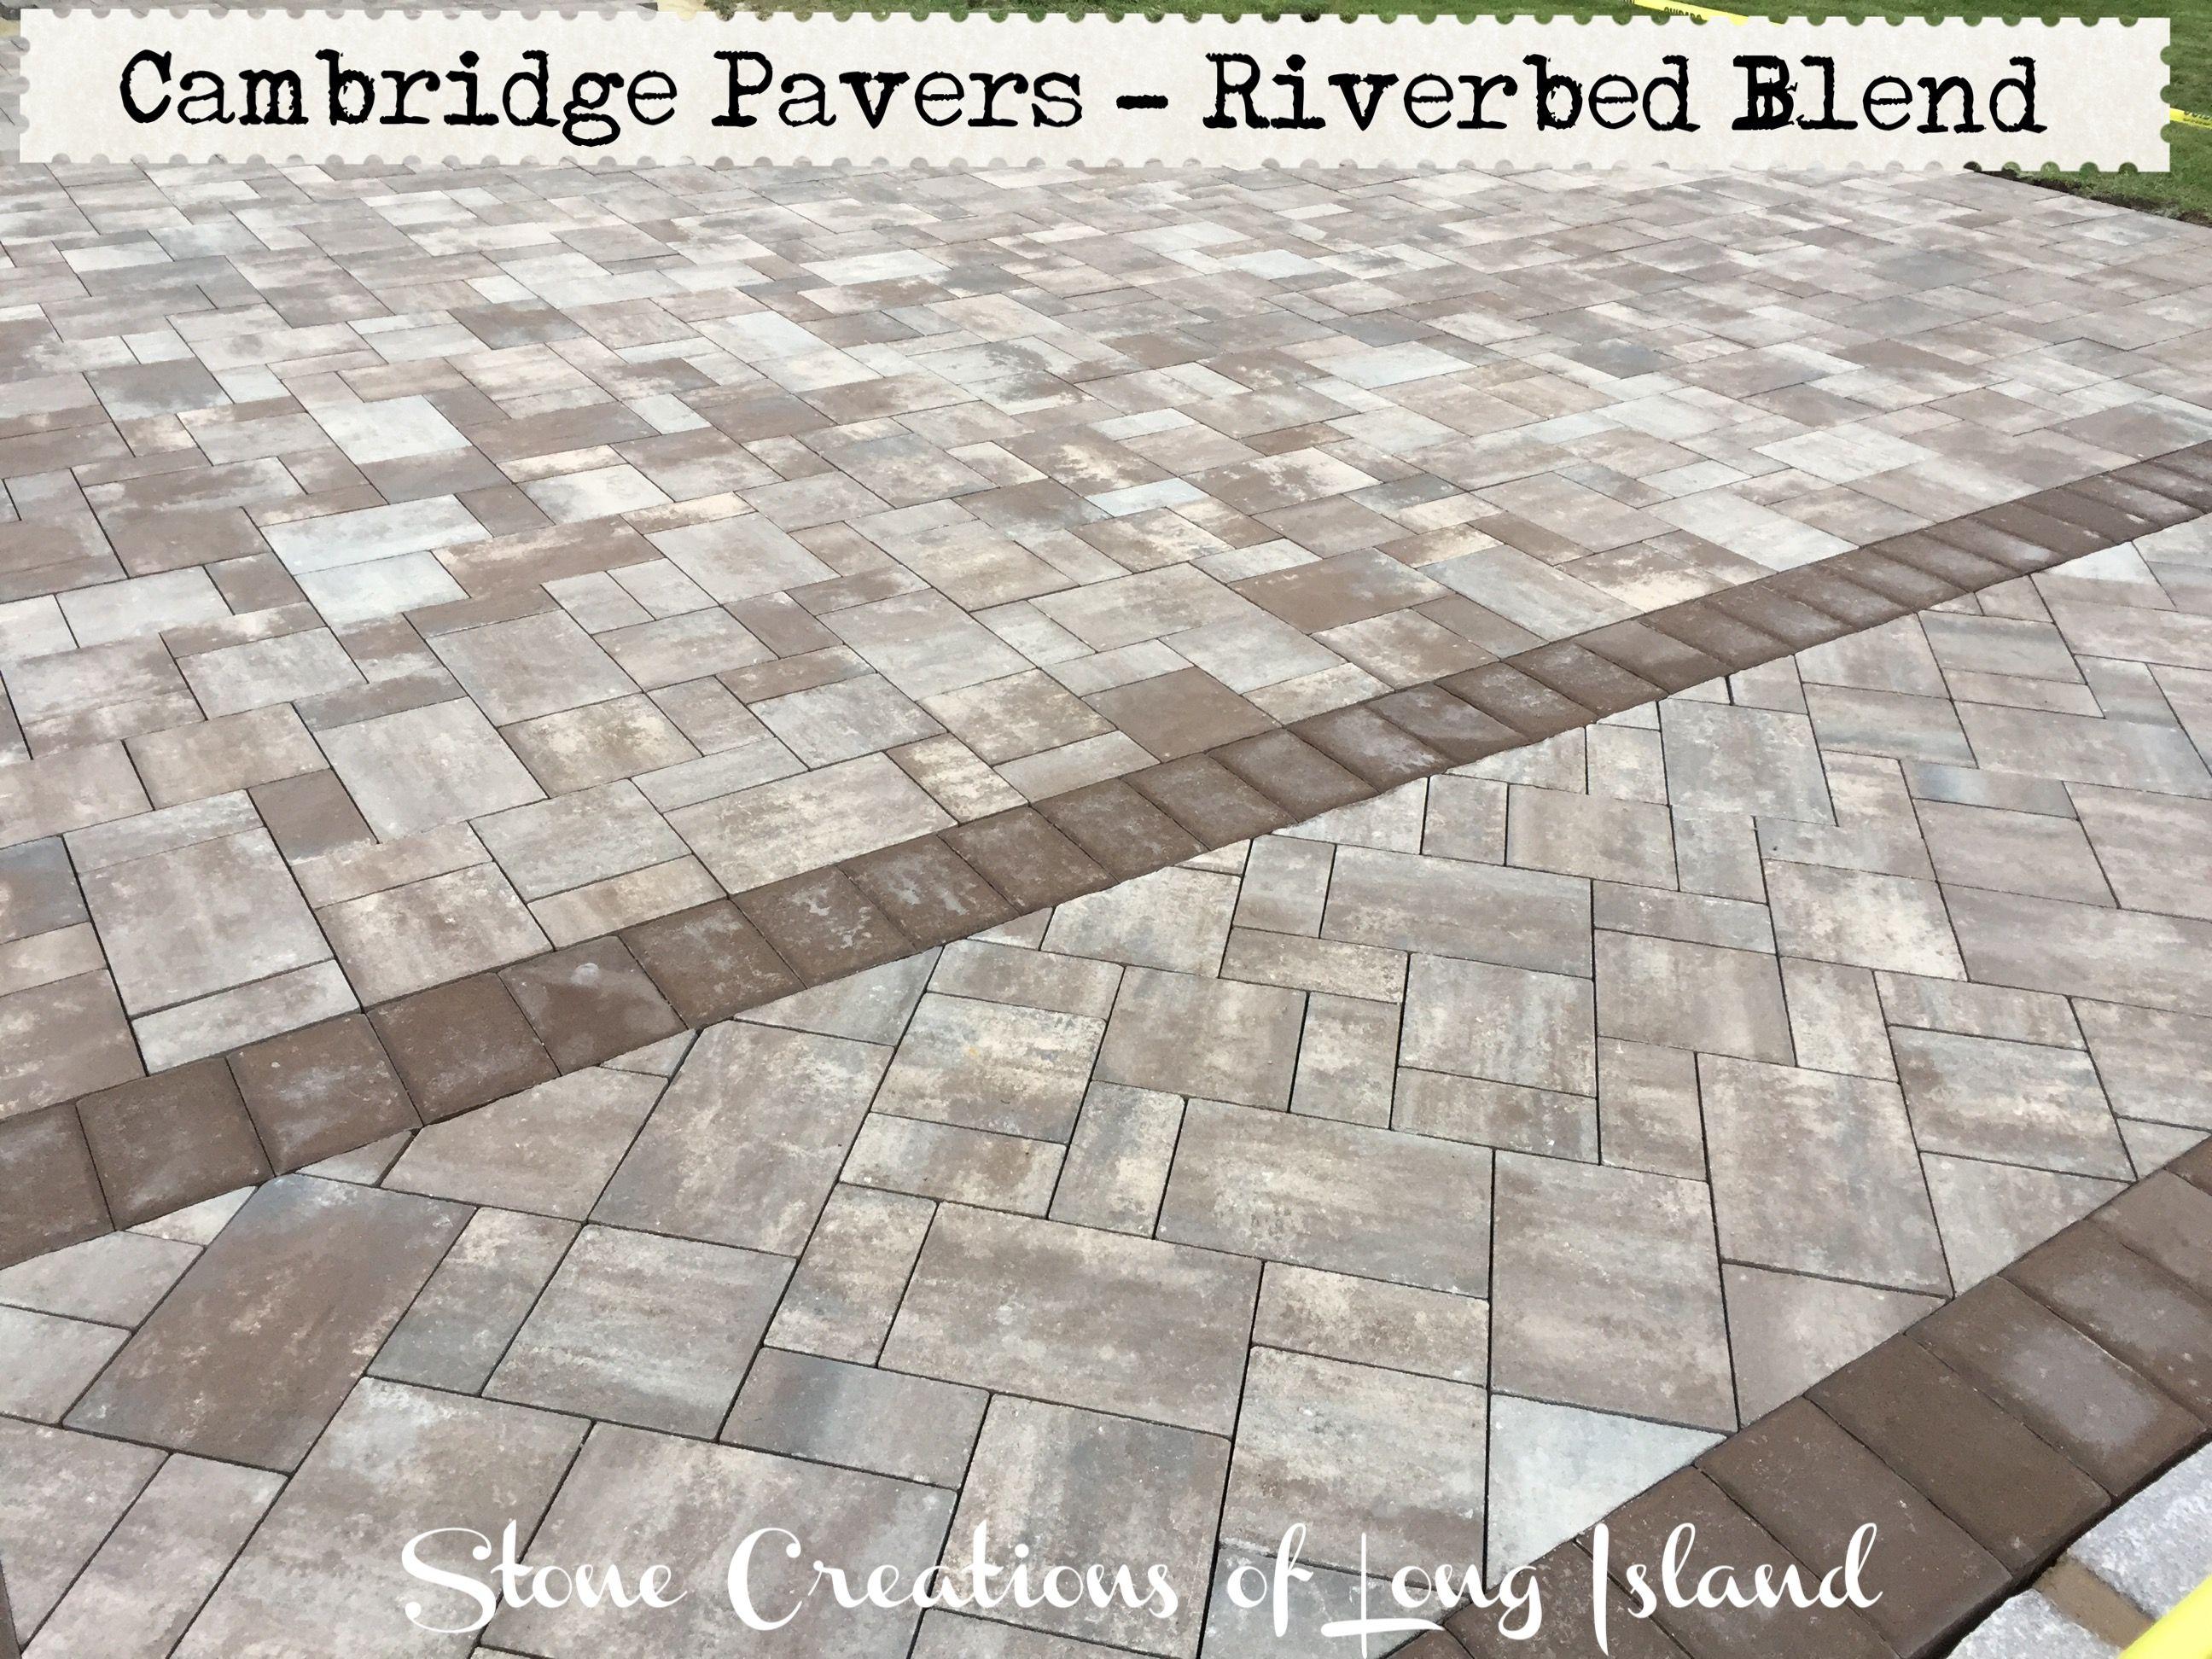 Lindenhurst Cambridge Paver Driveway And Walkways 11757